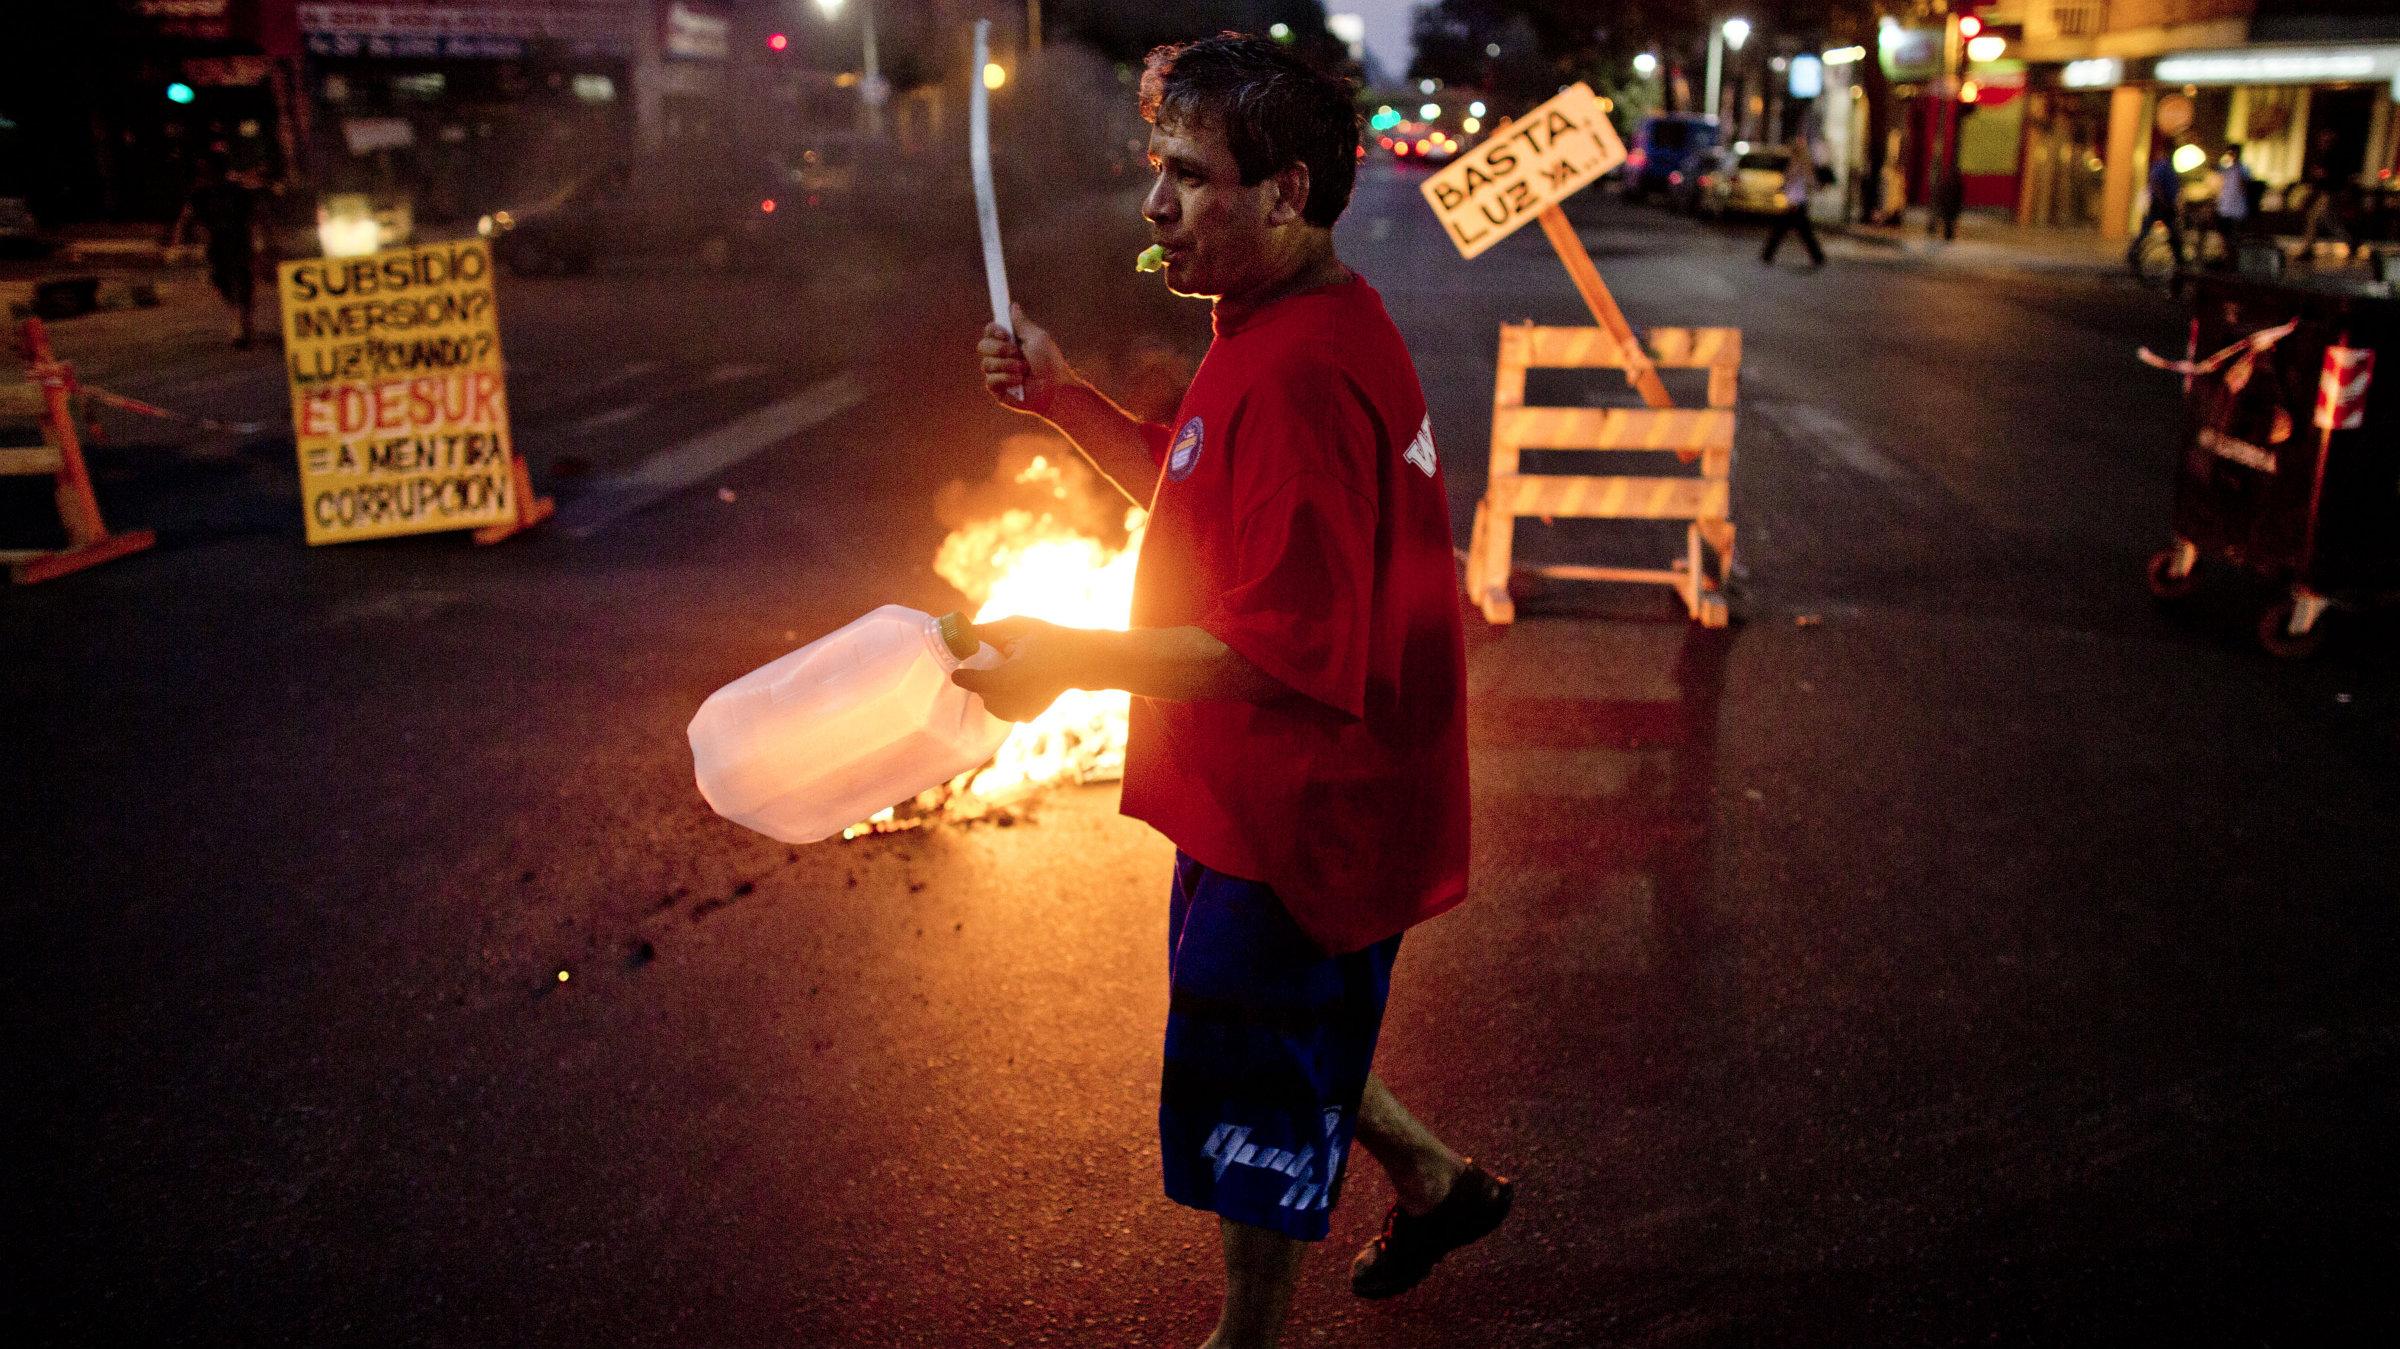 protestingman